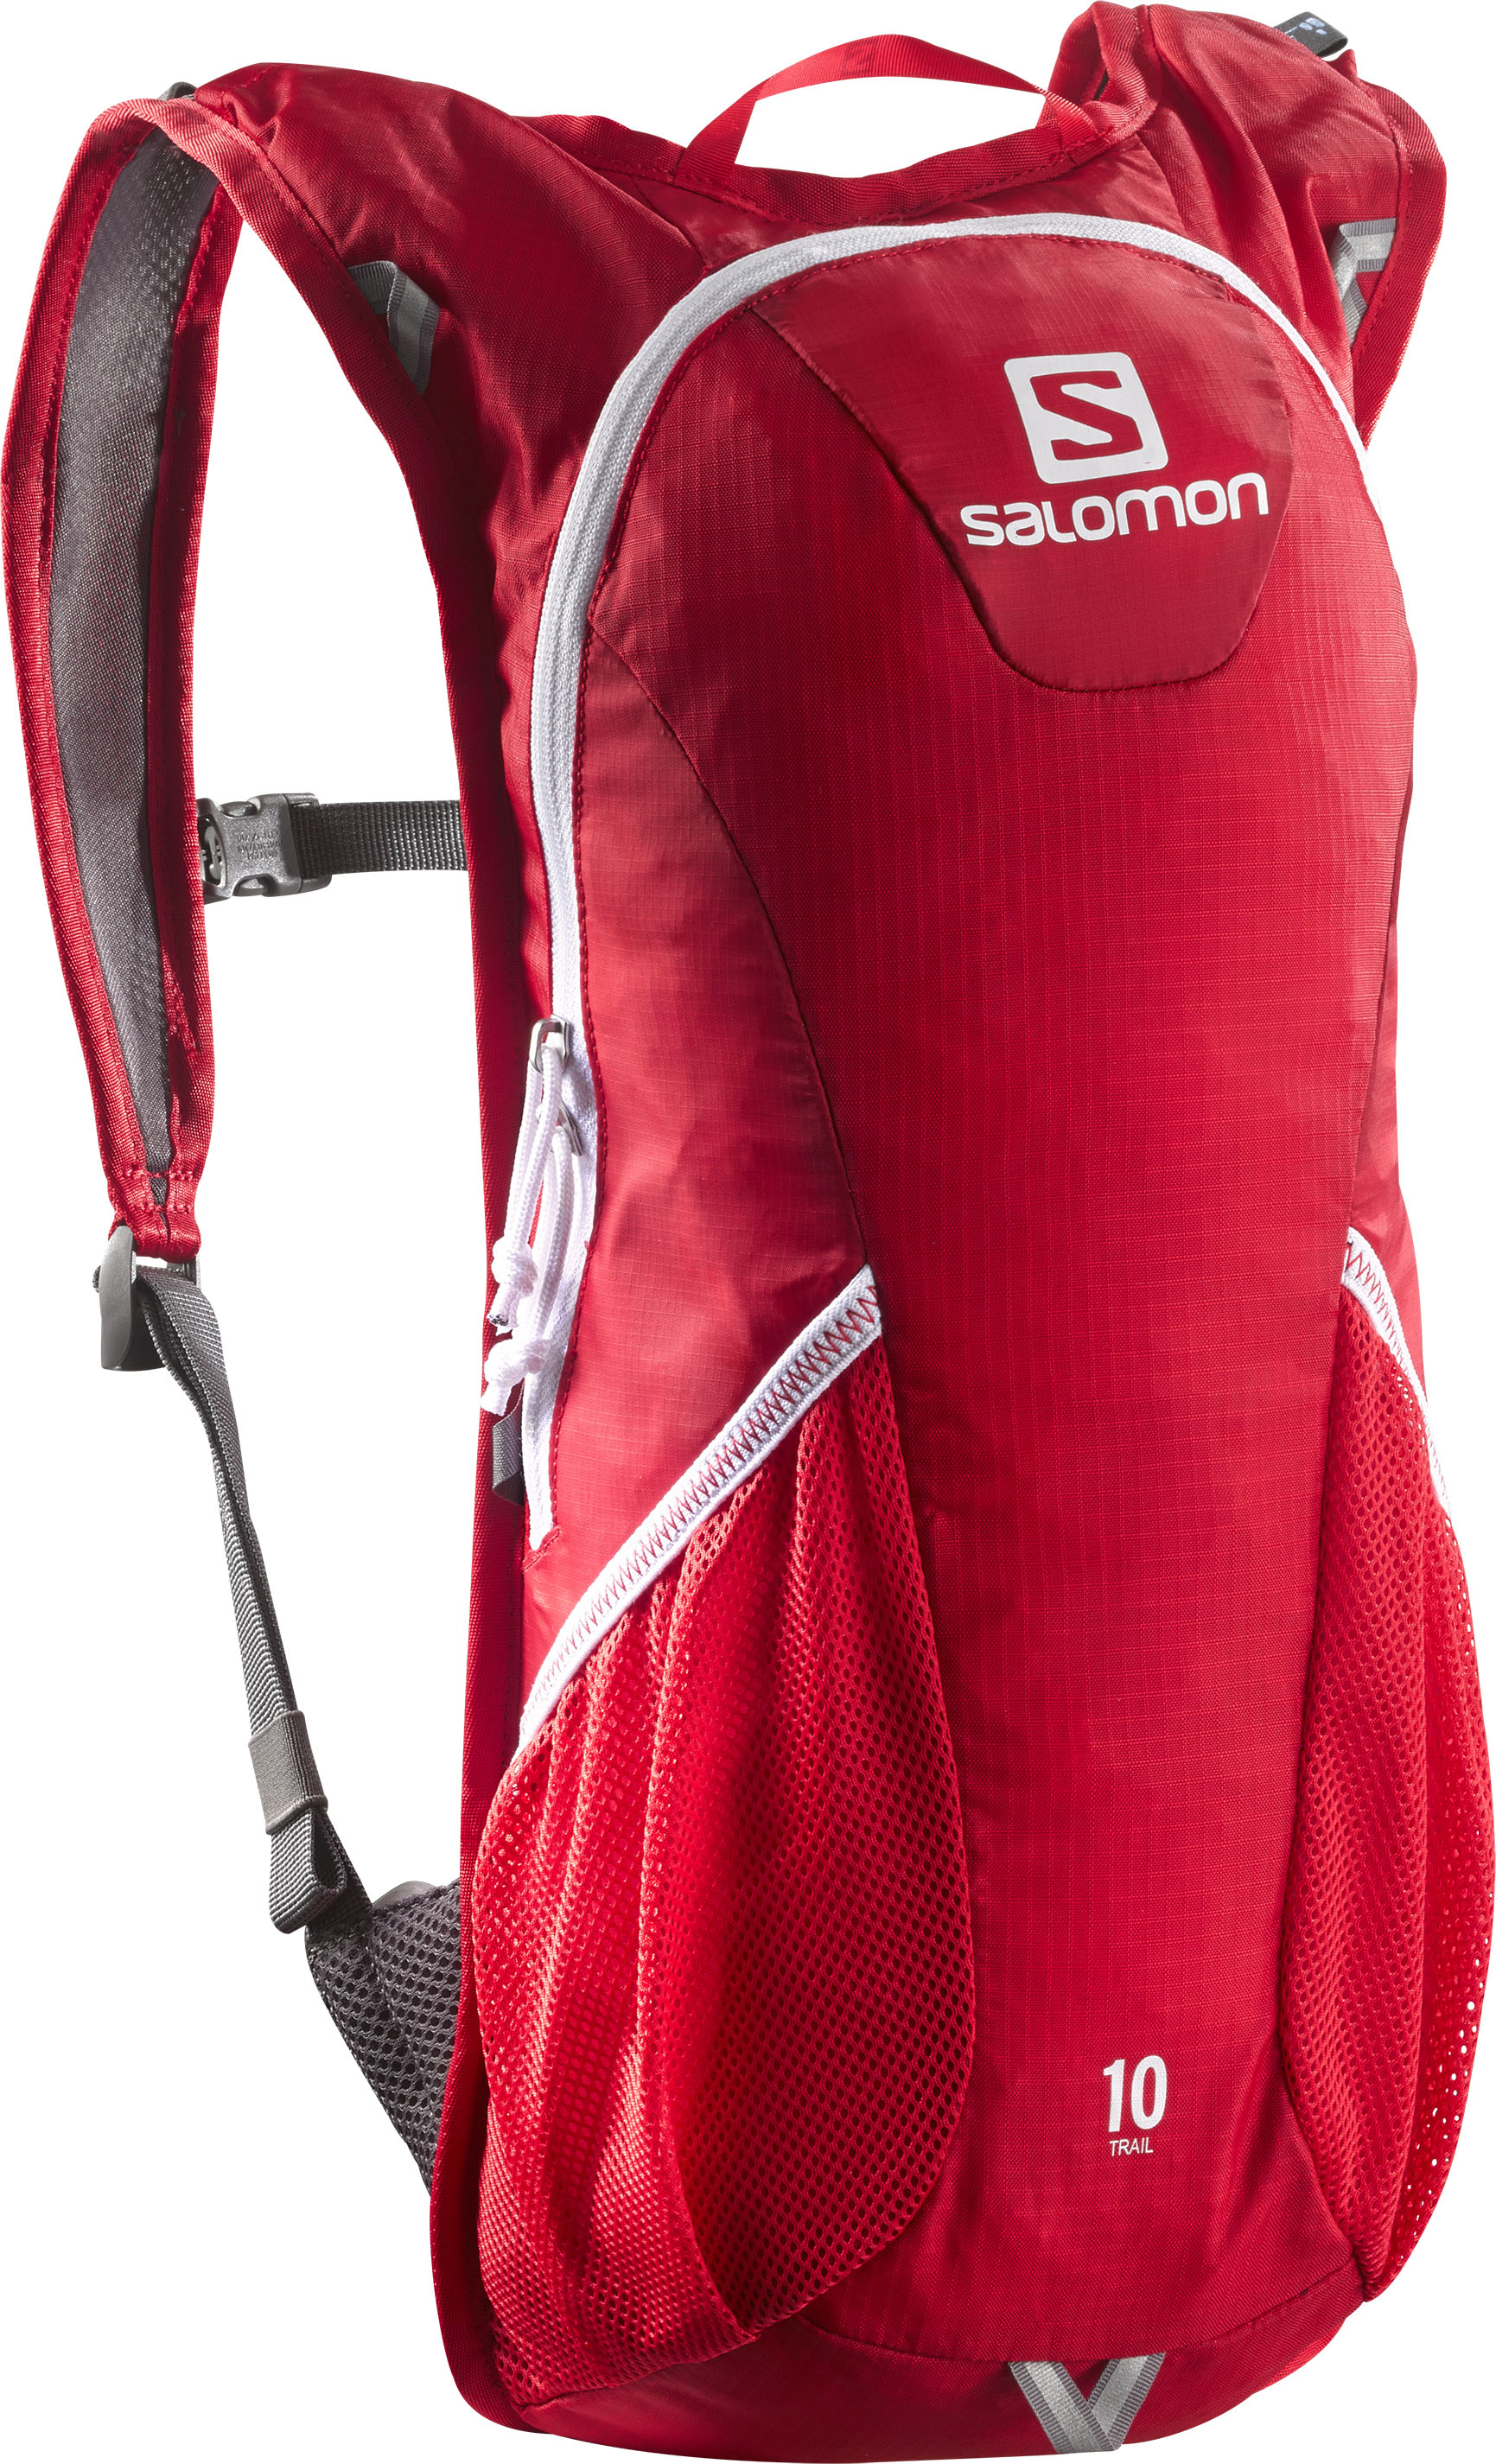 Salomon Trail 10 Bright Red/White 371708